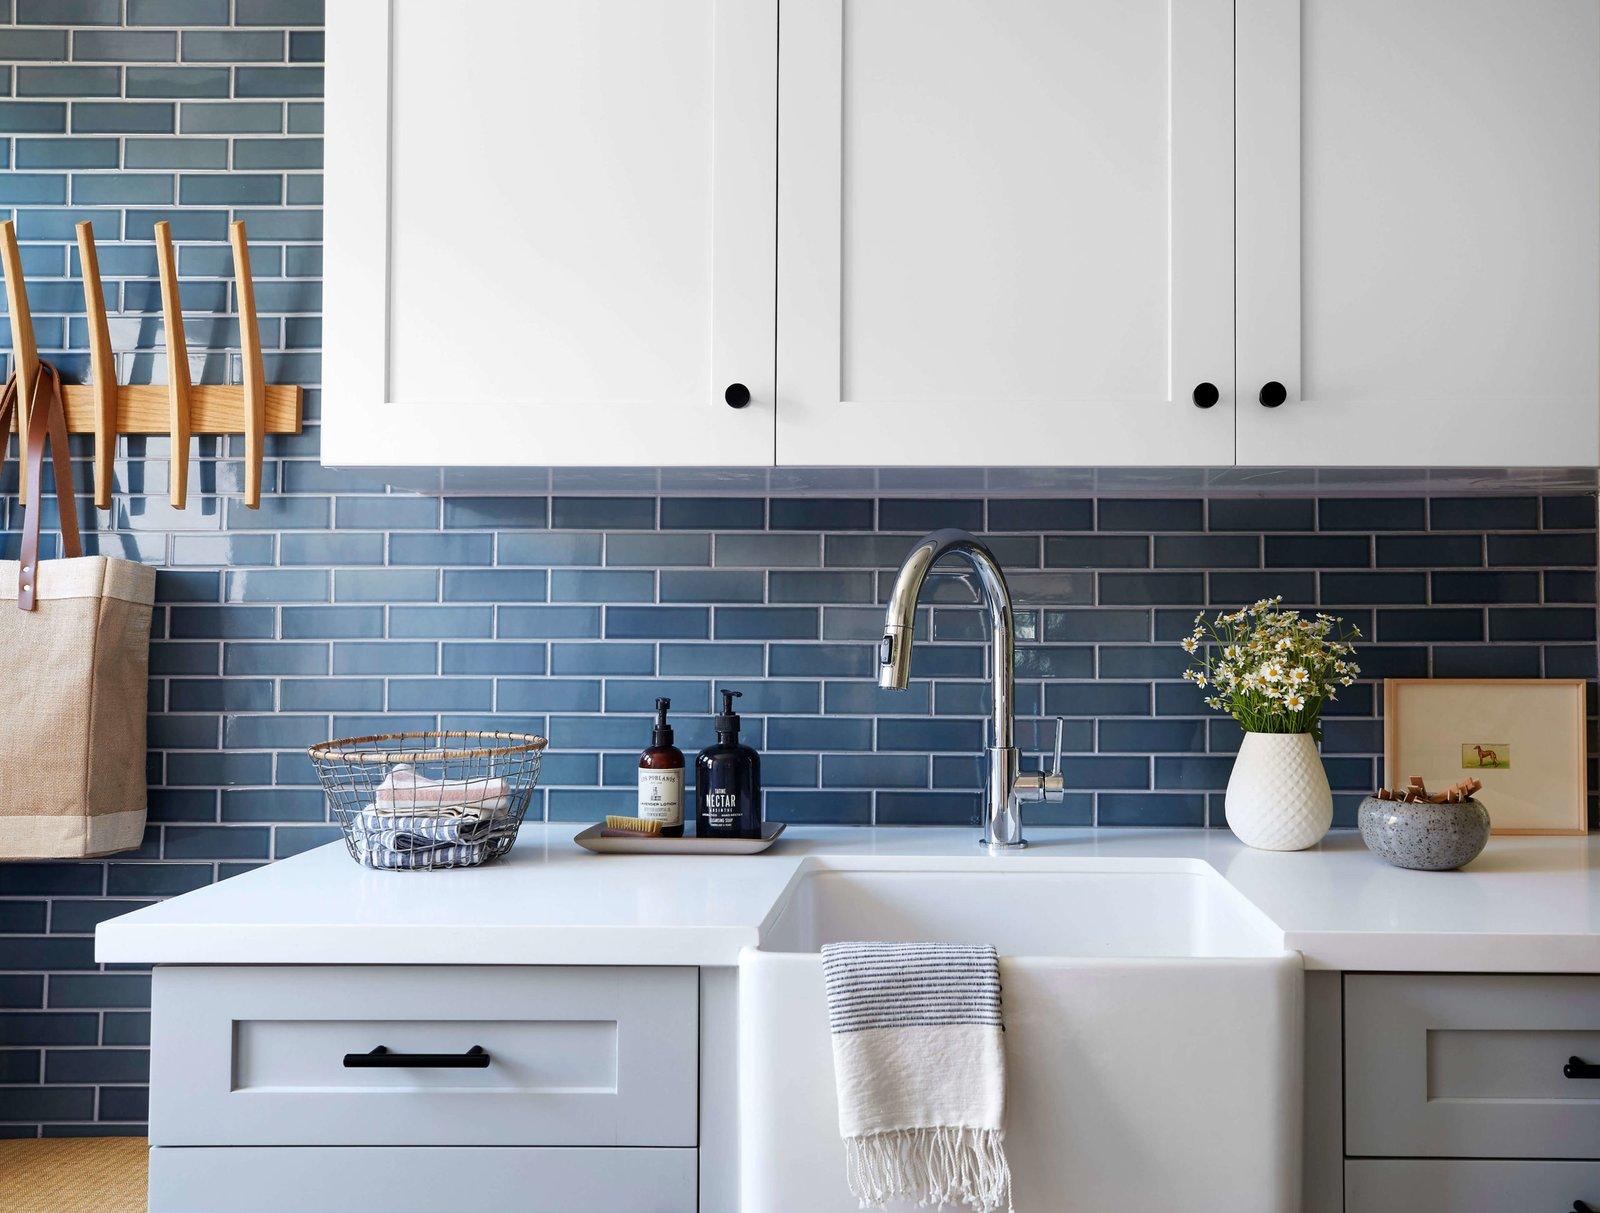 dazzling kitchen overhaul